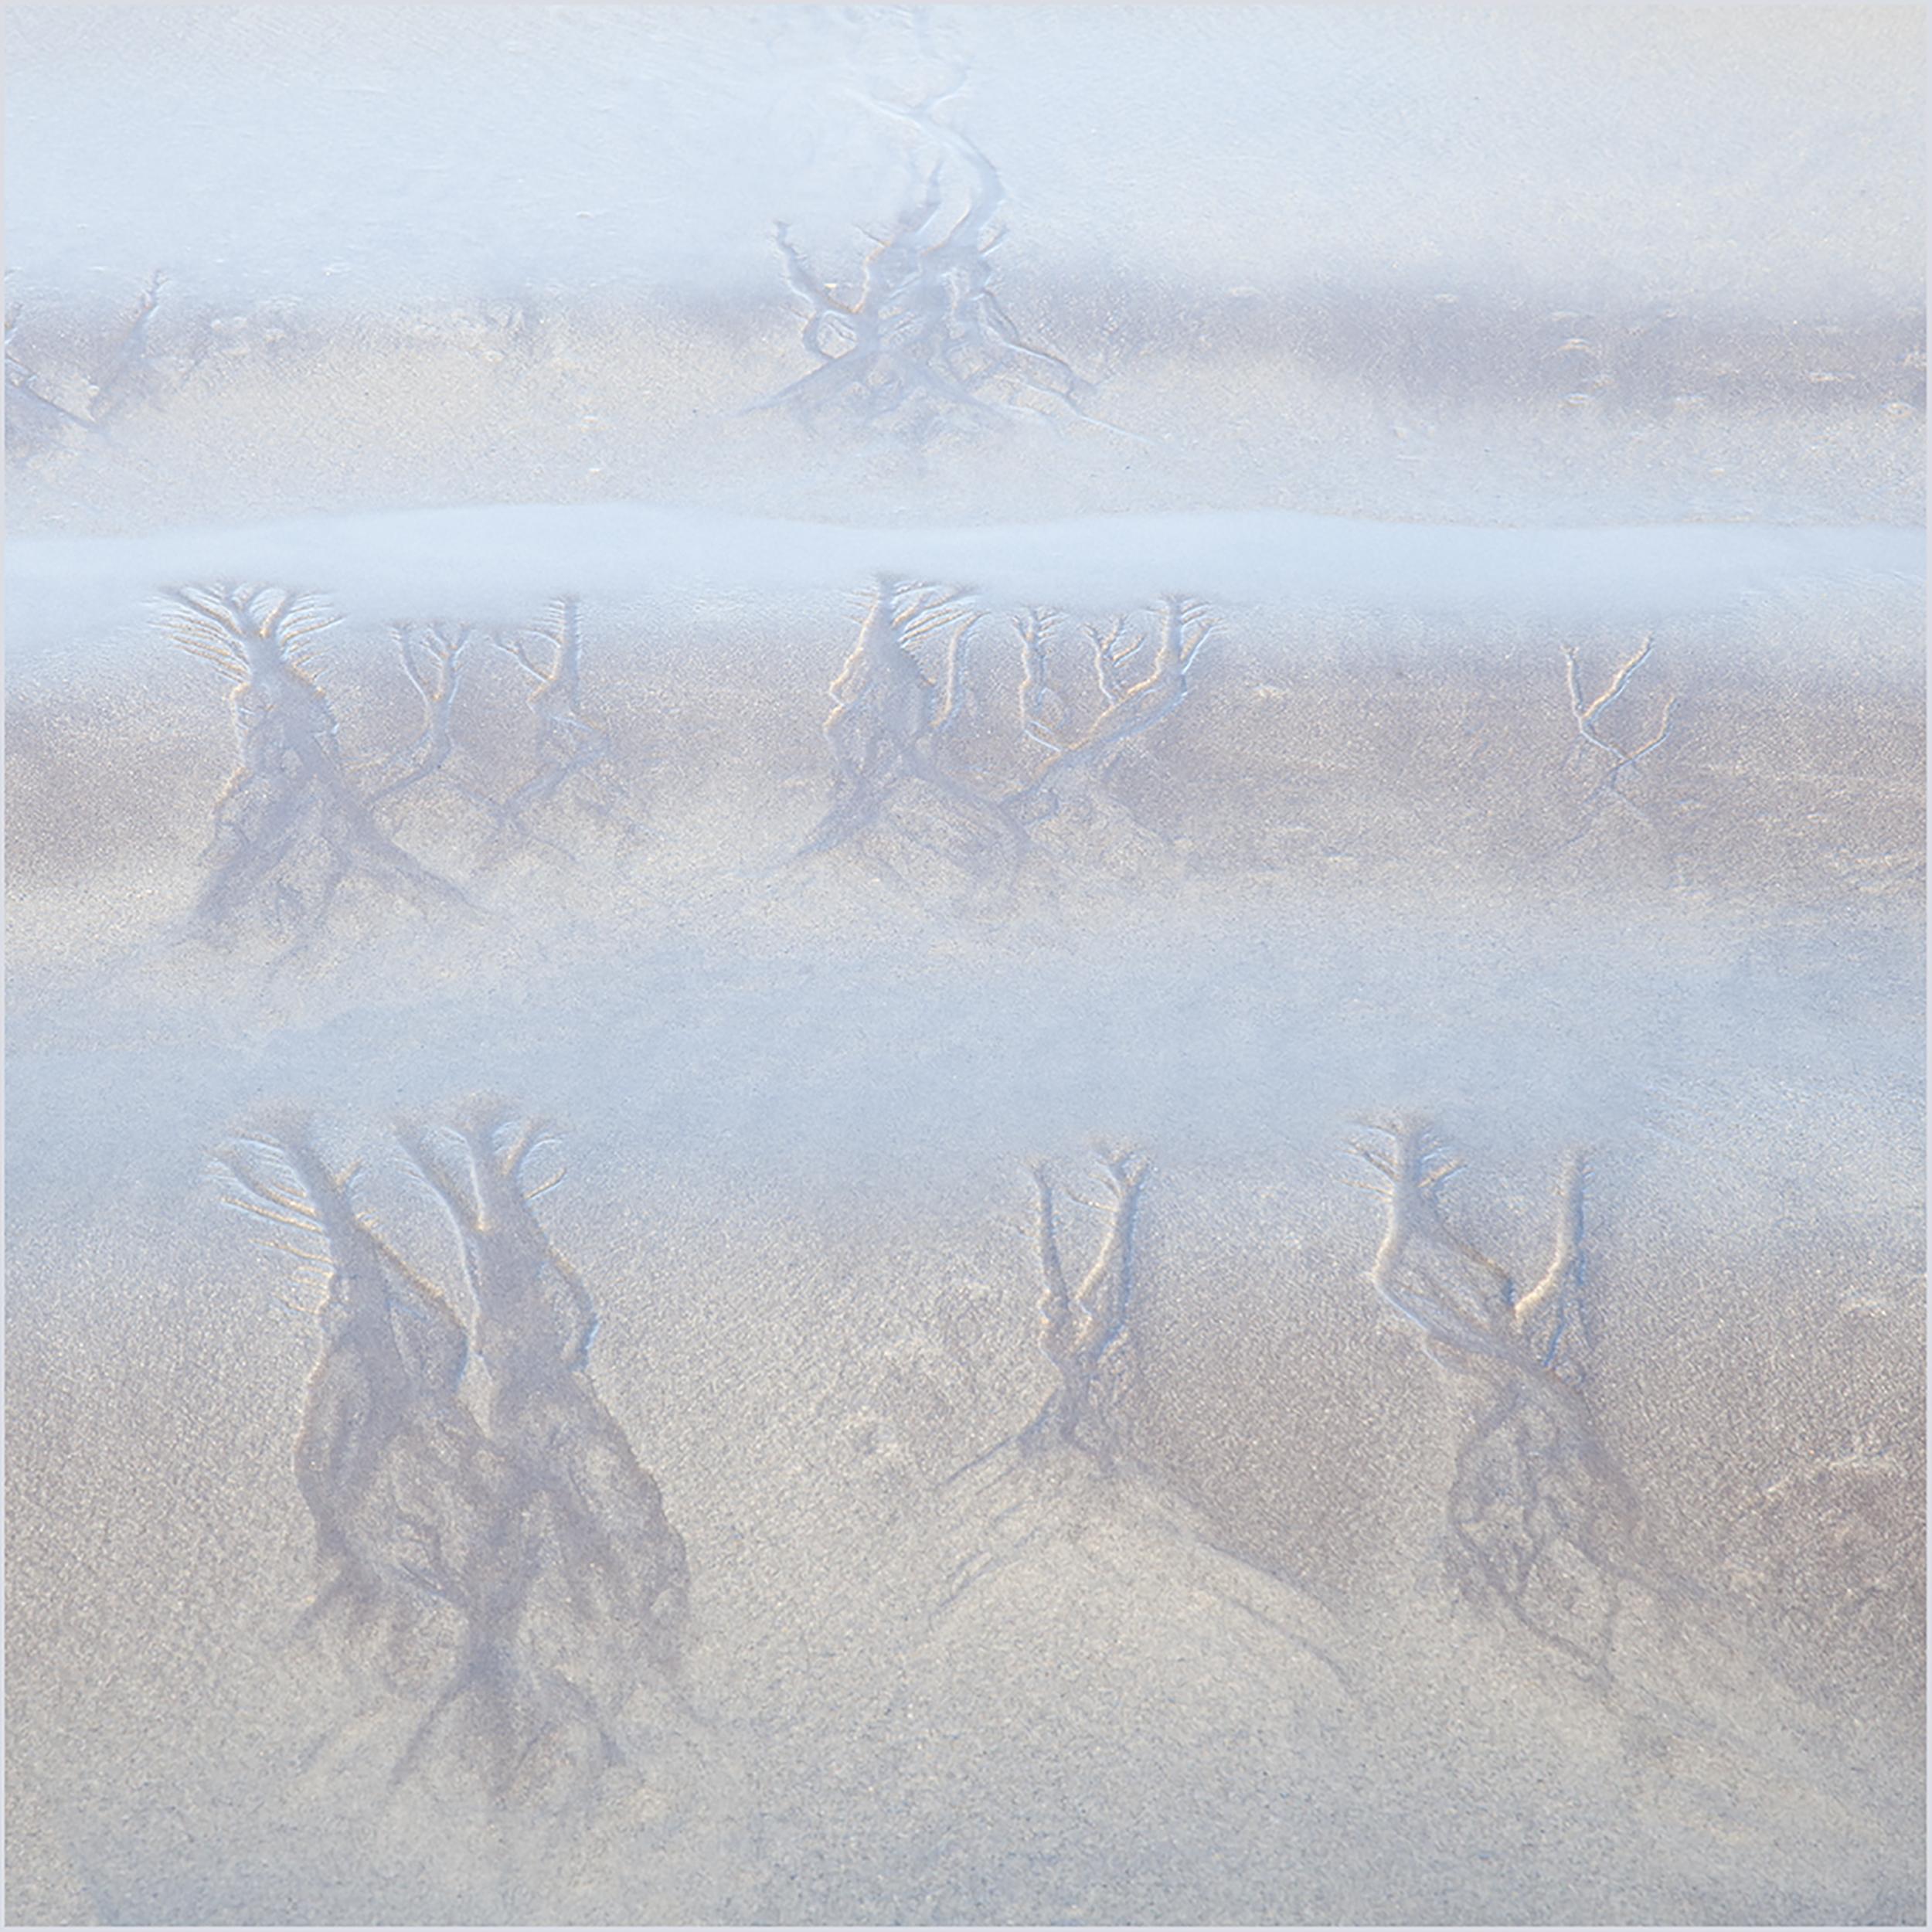 Sand & water 3.jpg